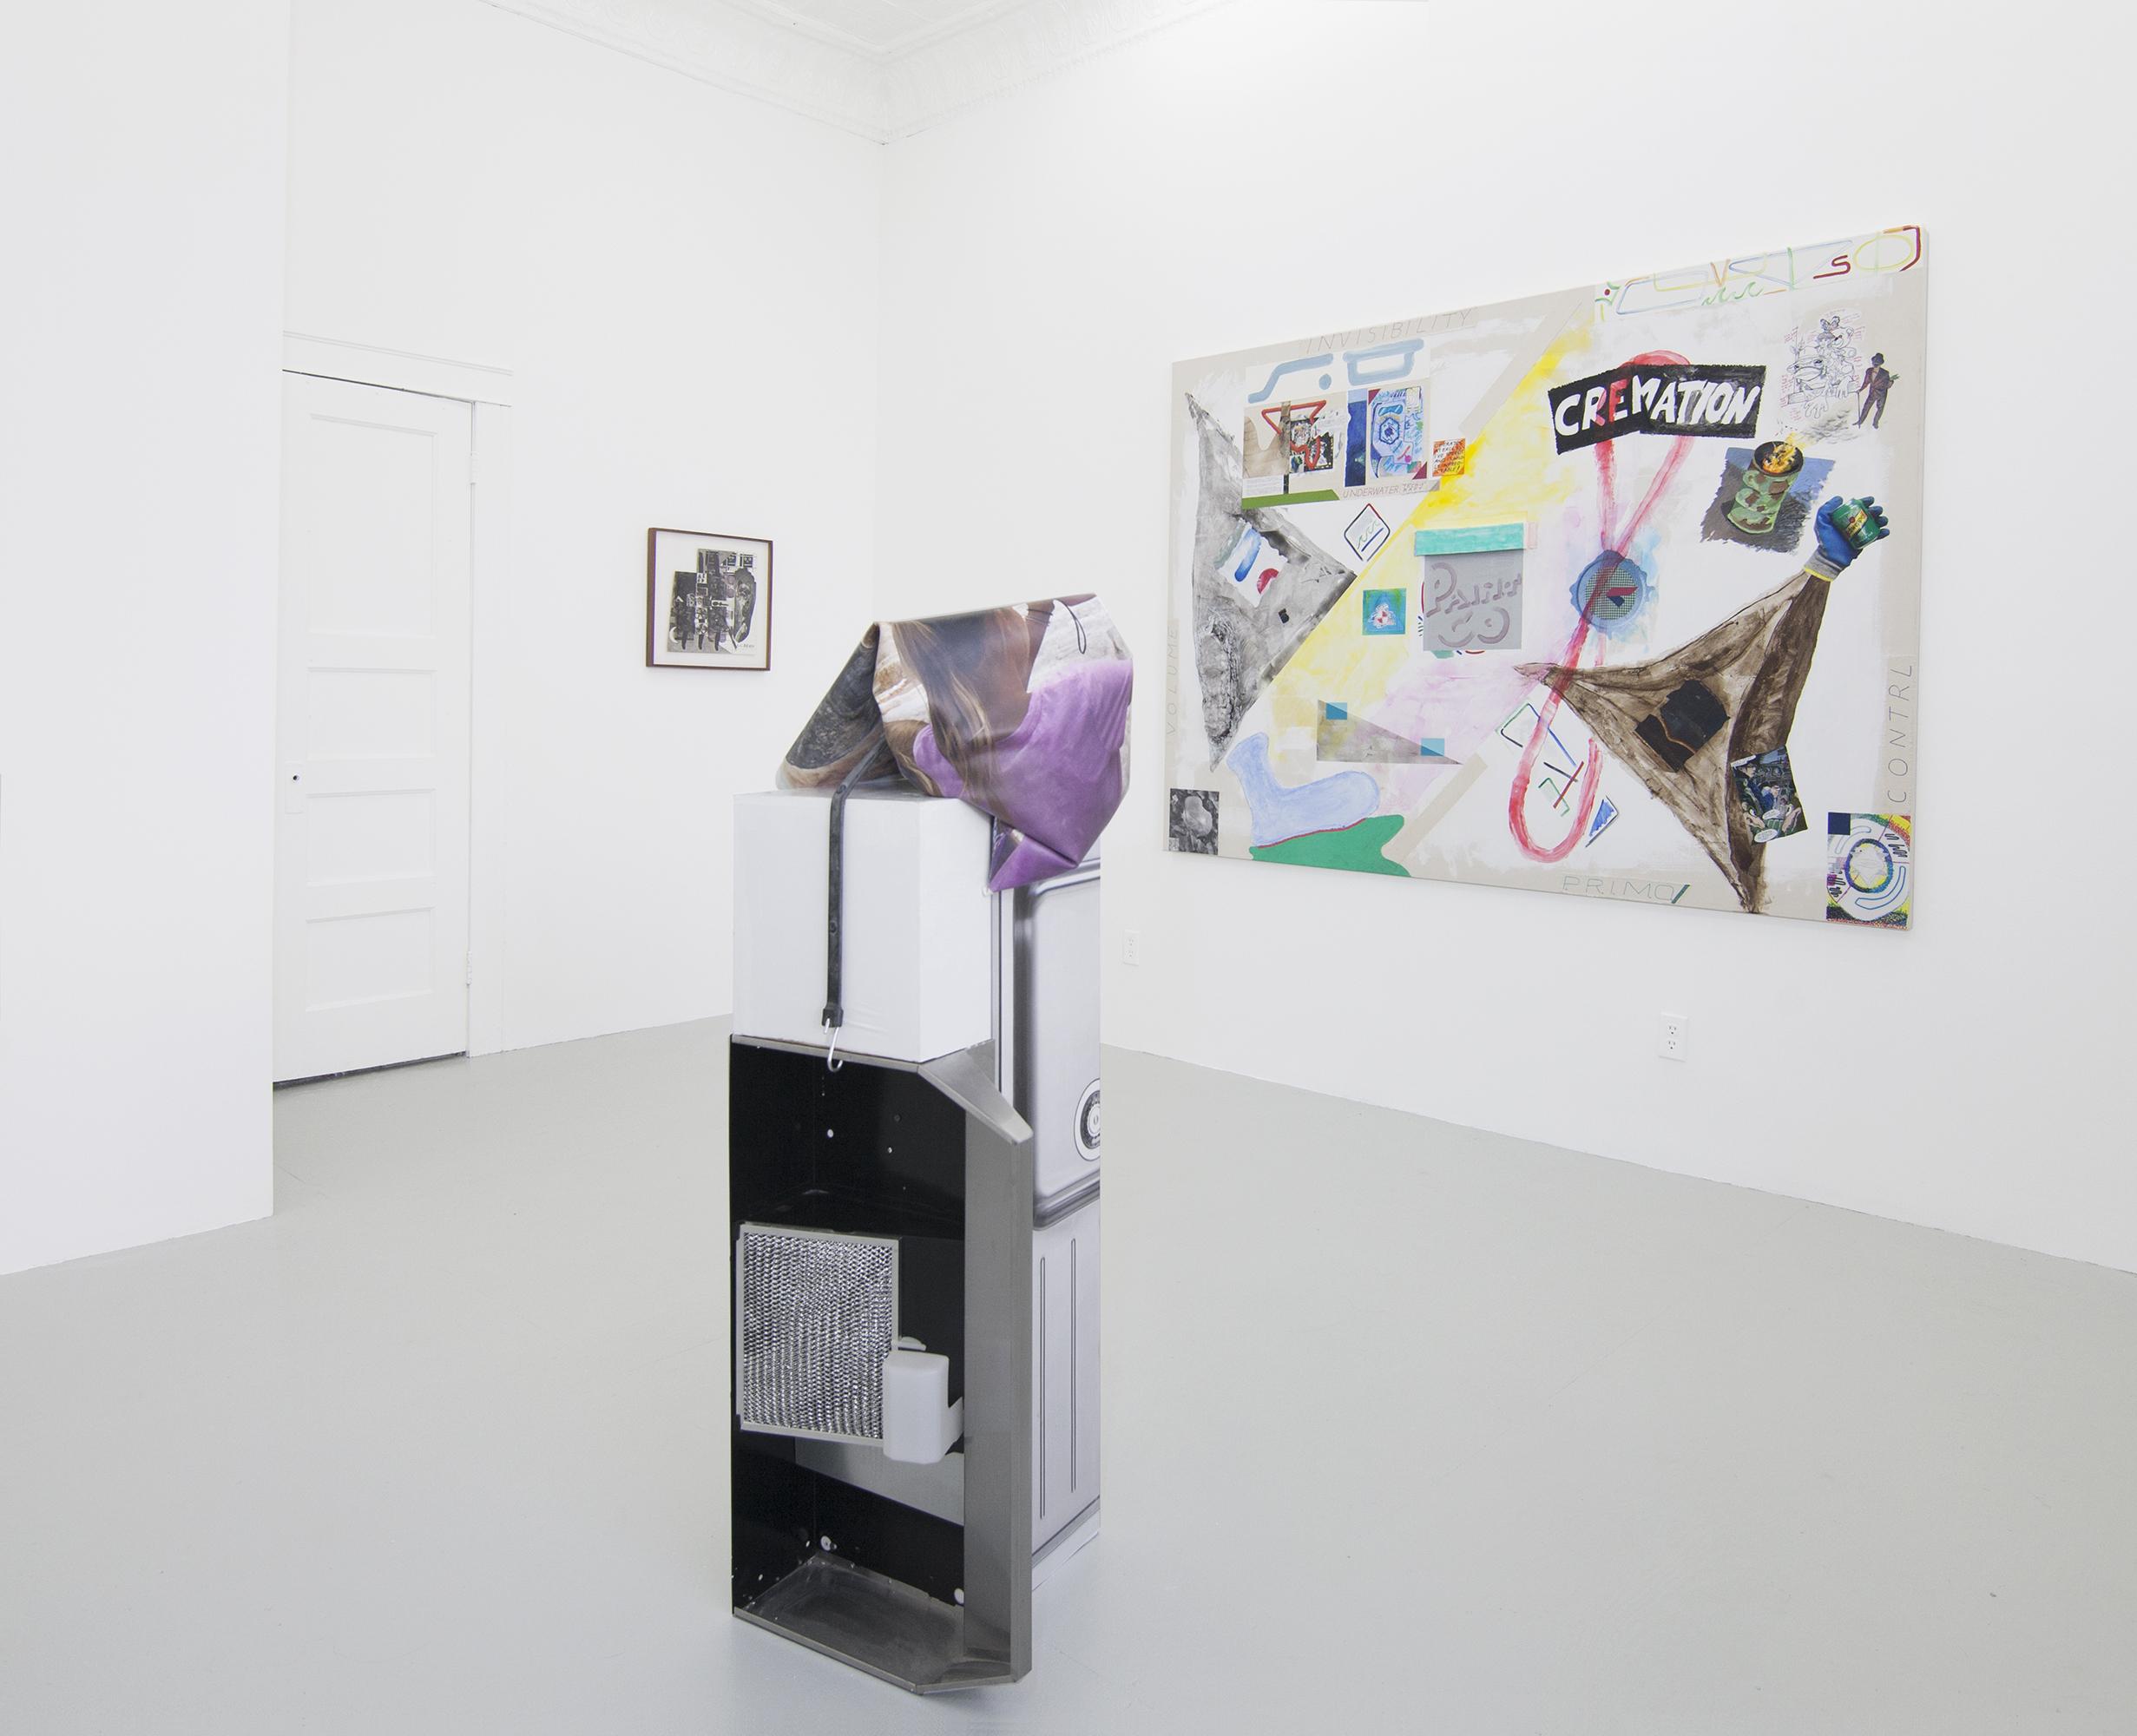 Umpawaug' s Bloom,  Installation View, 2015